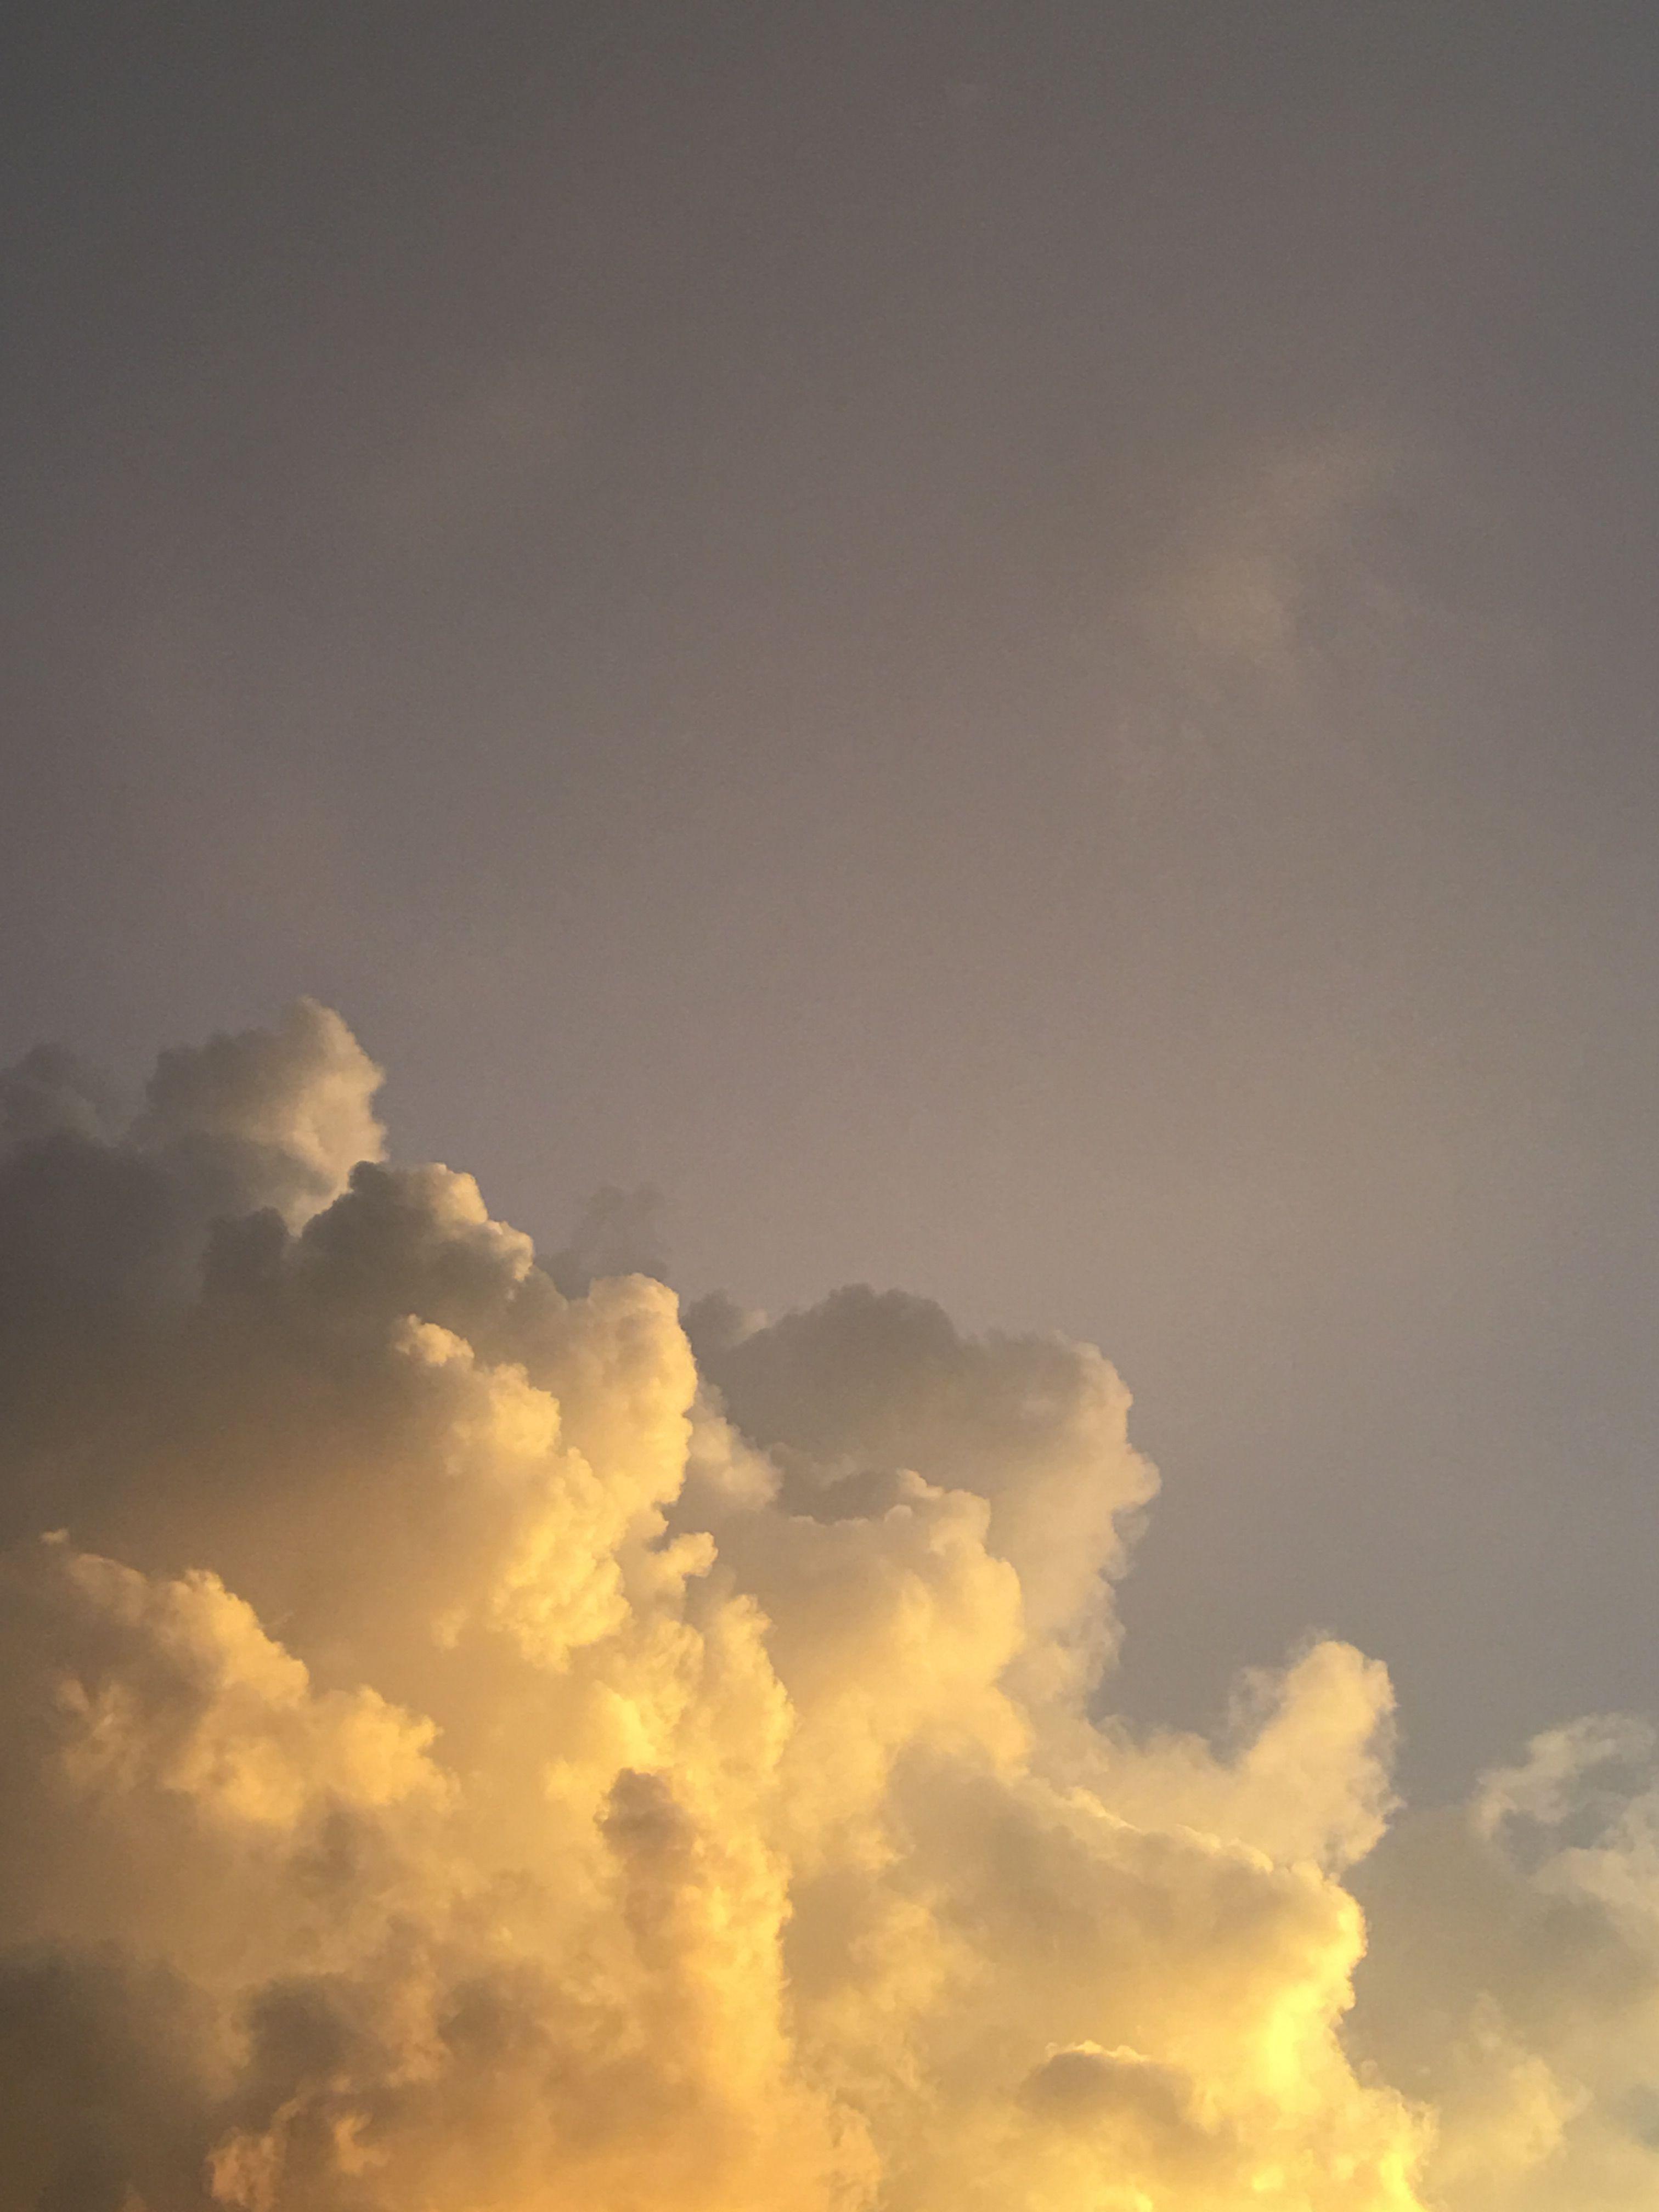 Blue Sky Iphone Aesthetic Wallpaper Sky Aesthetic Yellow Sky